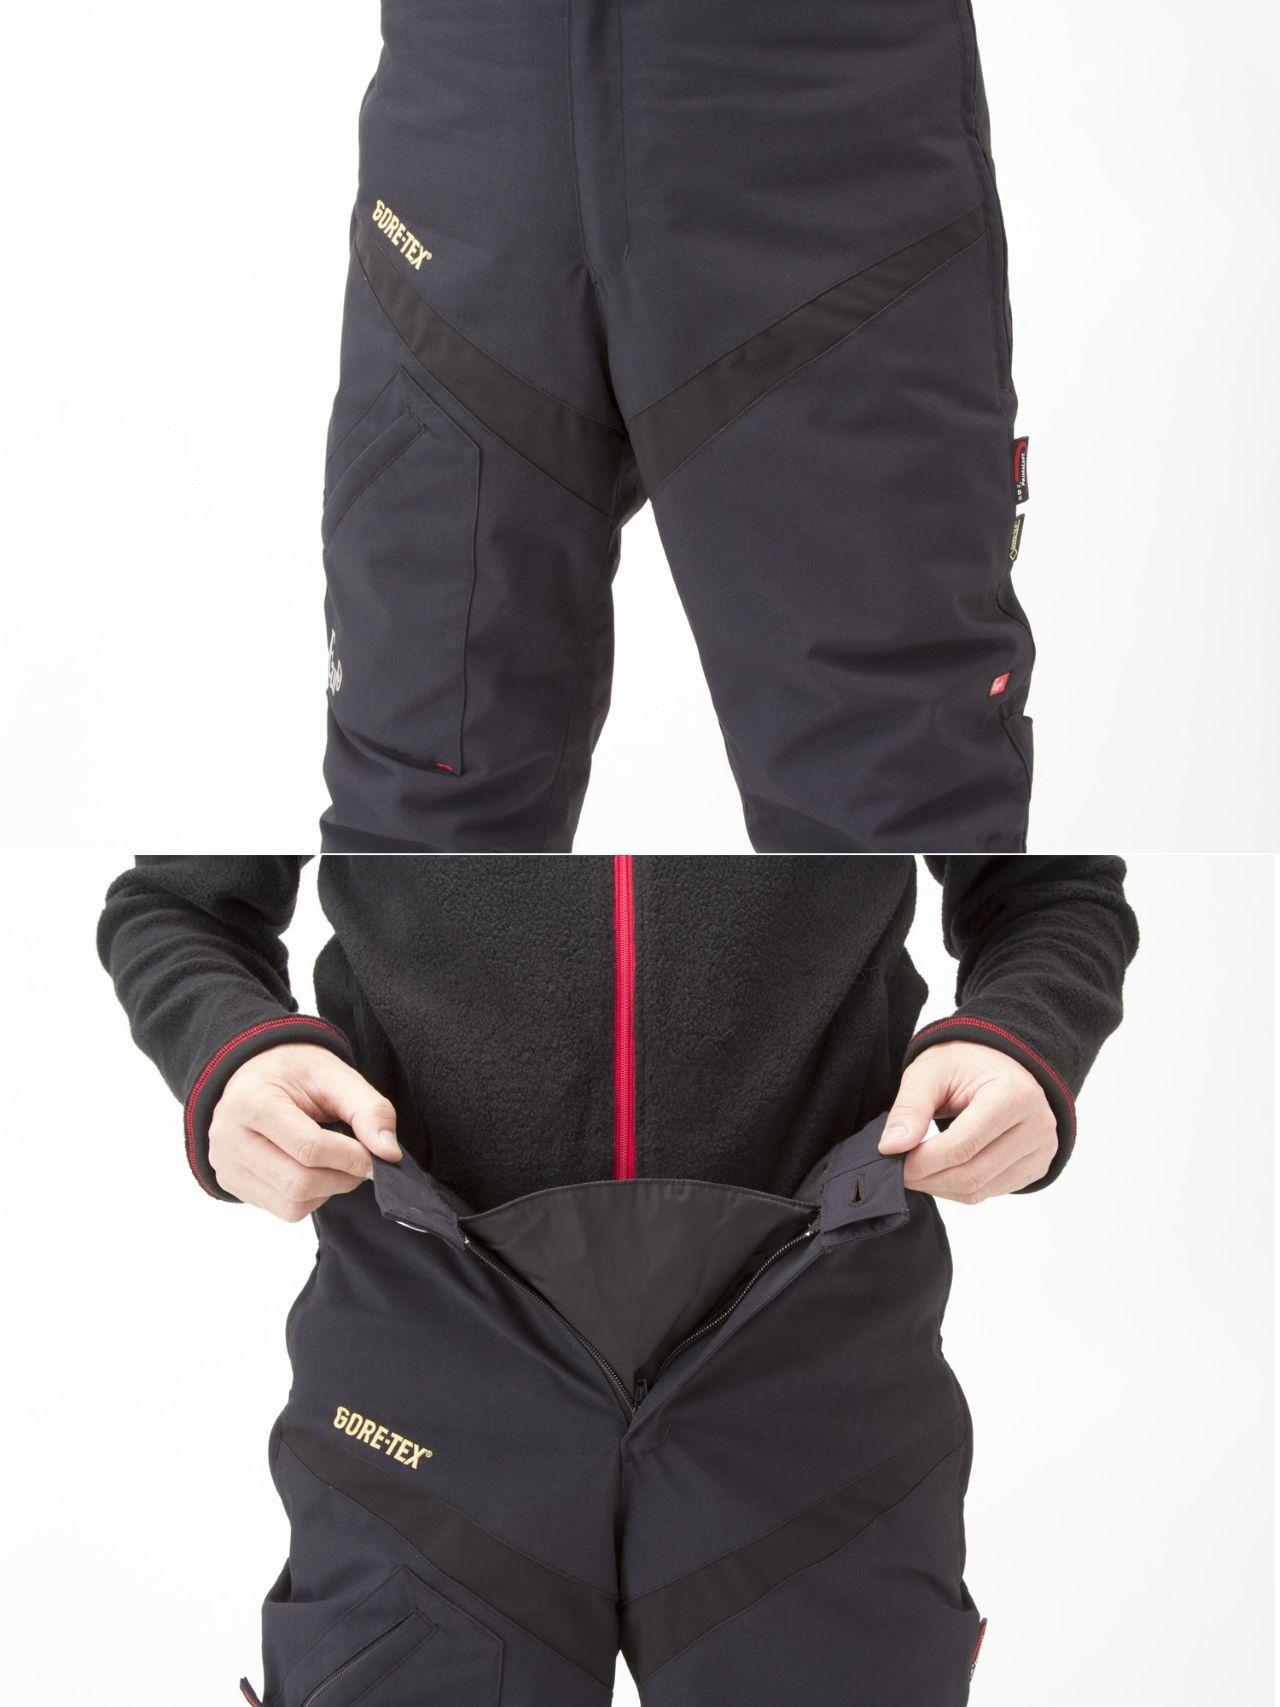 【GOLDWIN】GWS EURO  保暖車褲 GSM13451 - 「Webike-摩托百貨」